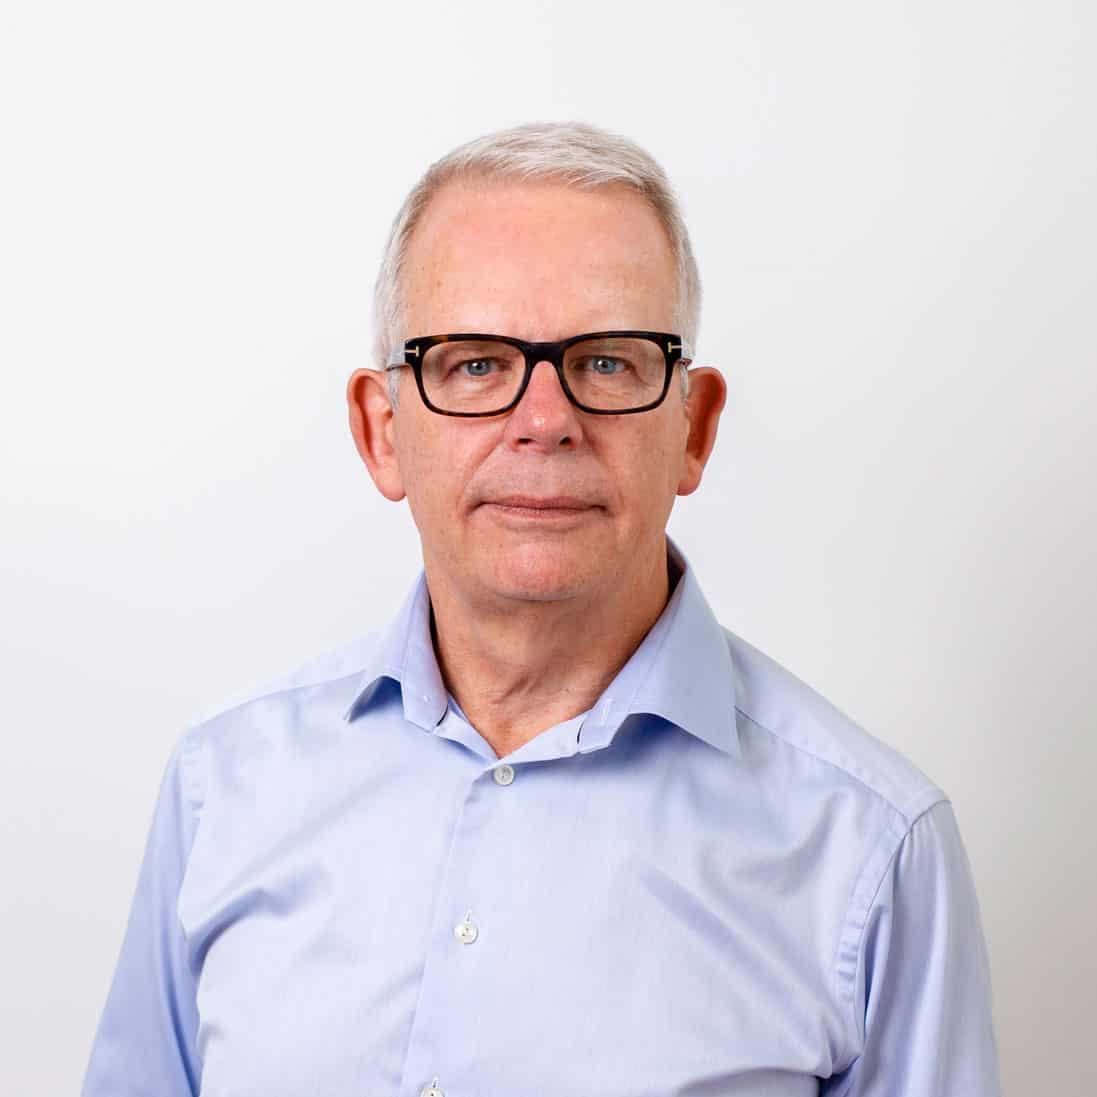 Joris van der Bijl Personal Executive & Business Coach Hilversum